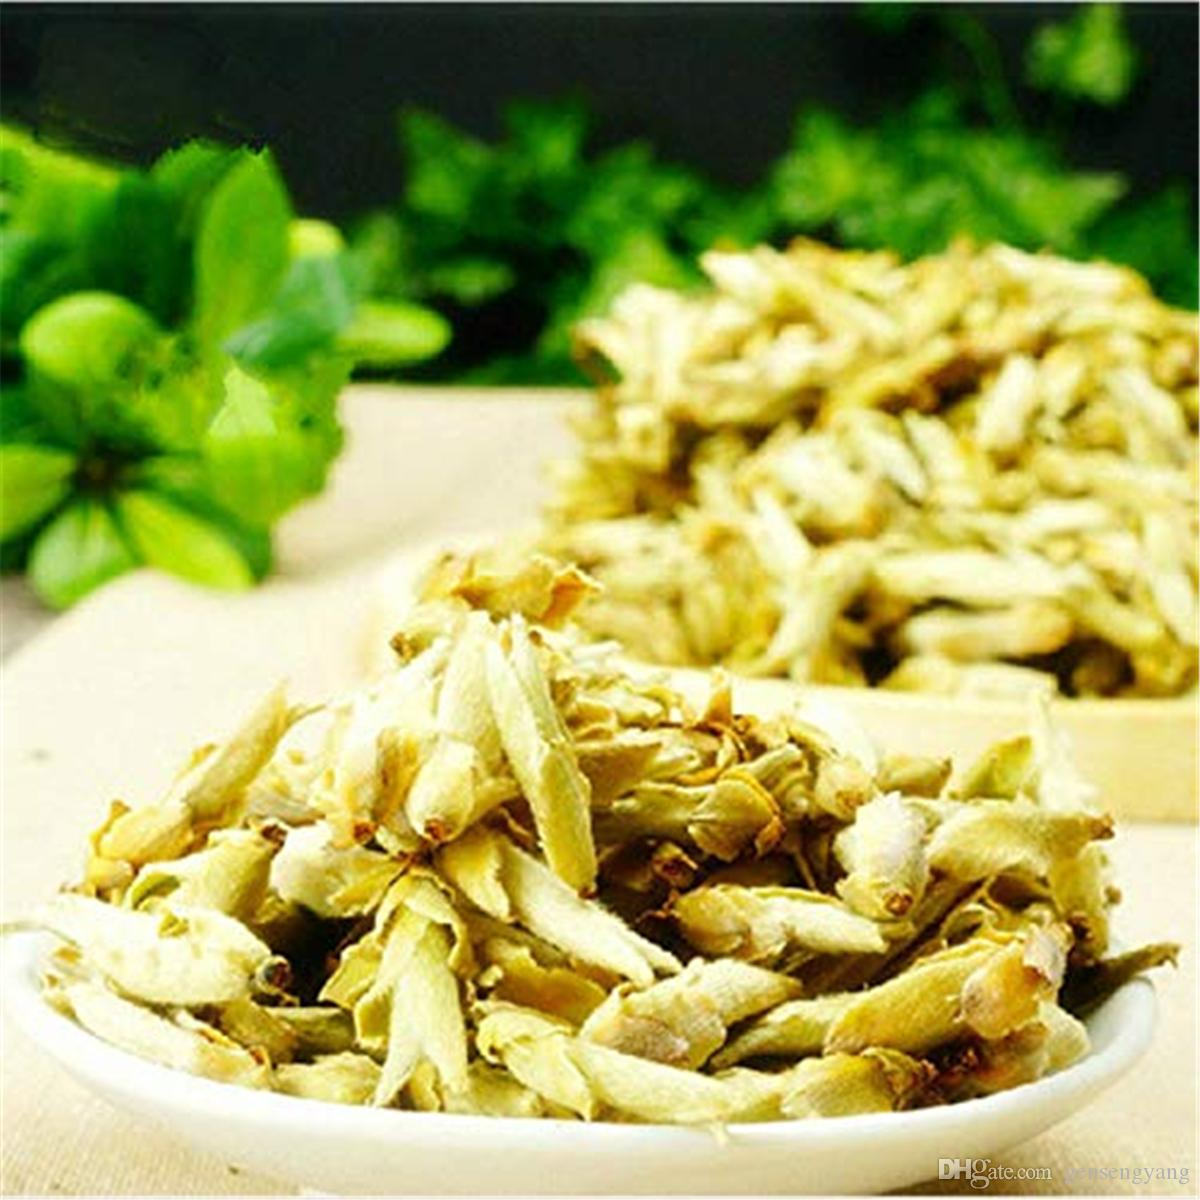 100g roher Puer Tee Yunnan lose weiß Puer Tee Bio Pu'er Alter Baum Grün Puer Natur Puerh Tea Factory Direct Sales